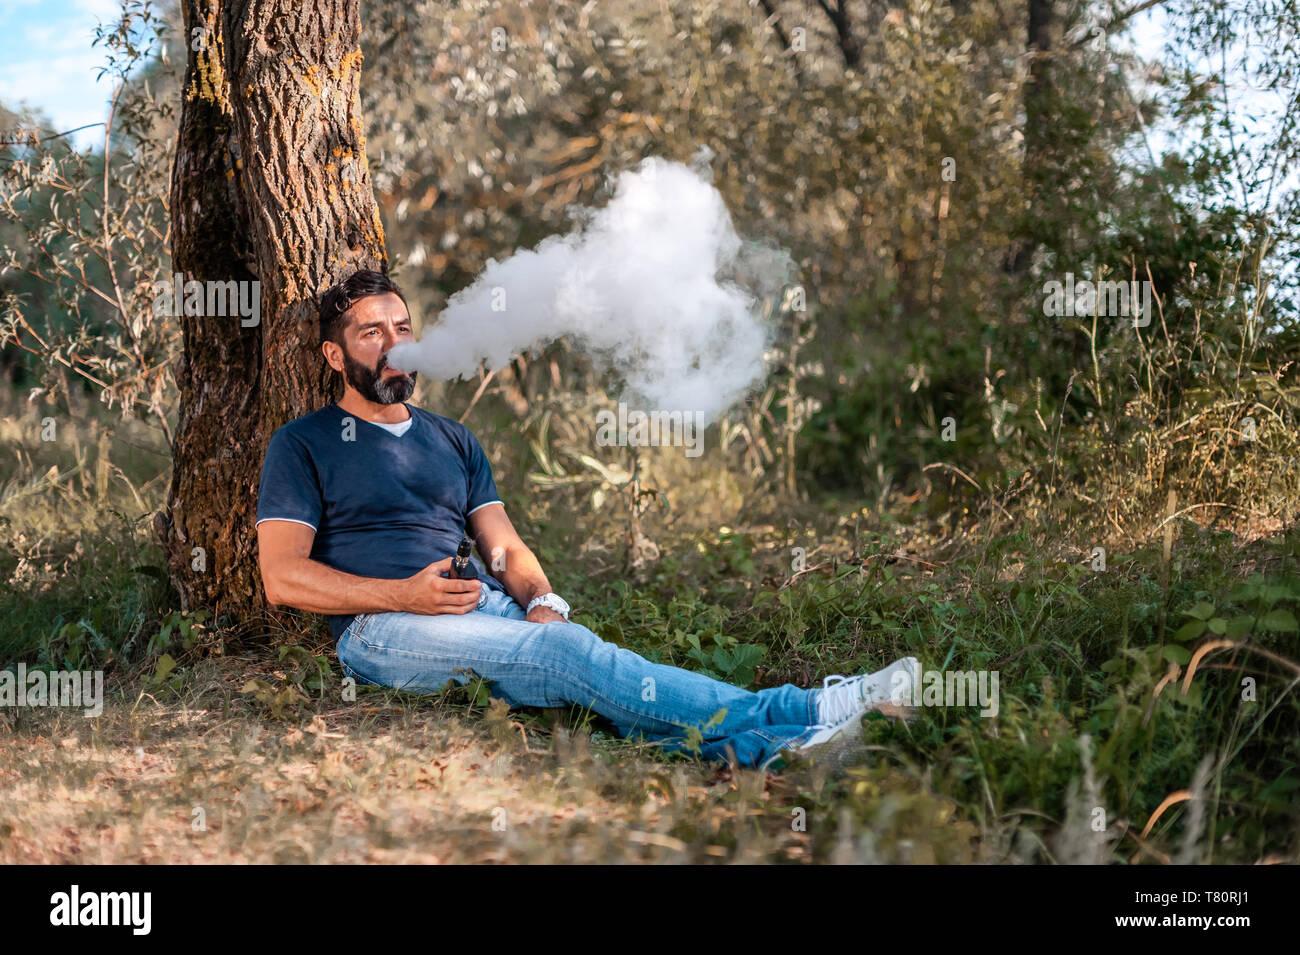 Handsome smoker enjoying an e-cigarette. Electronic cigarette. - Stock Image